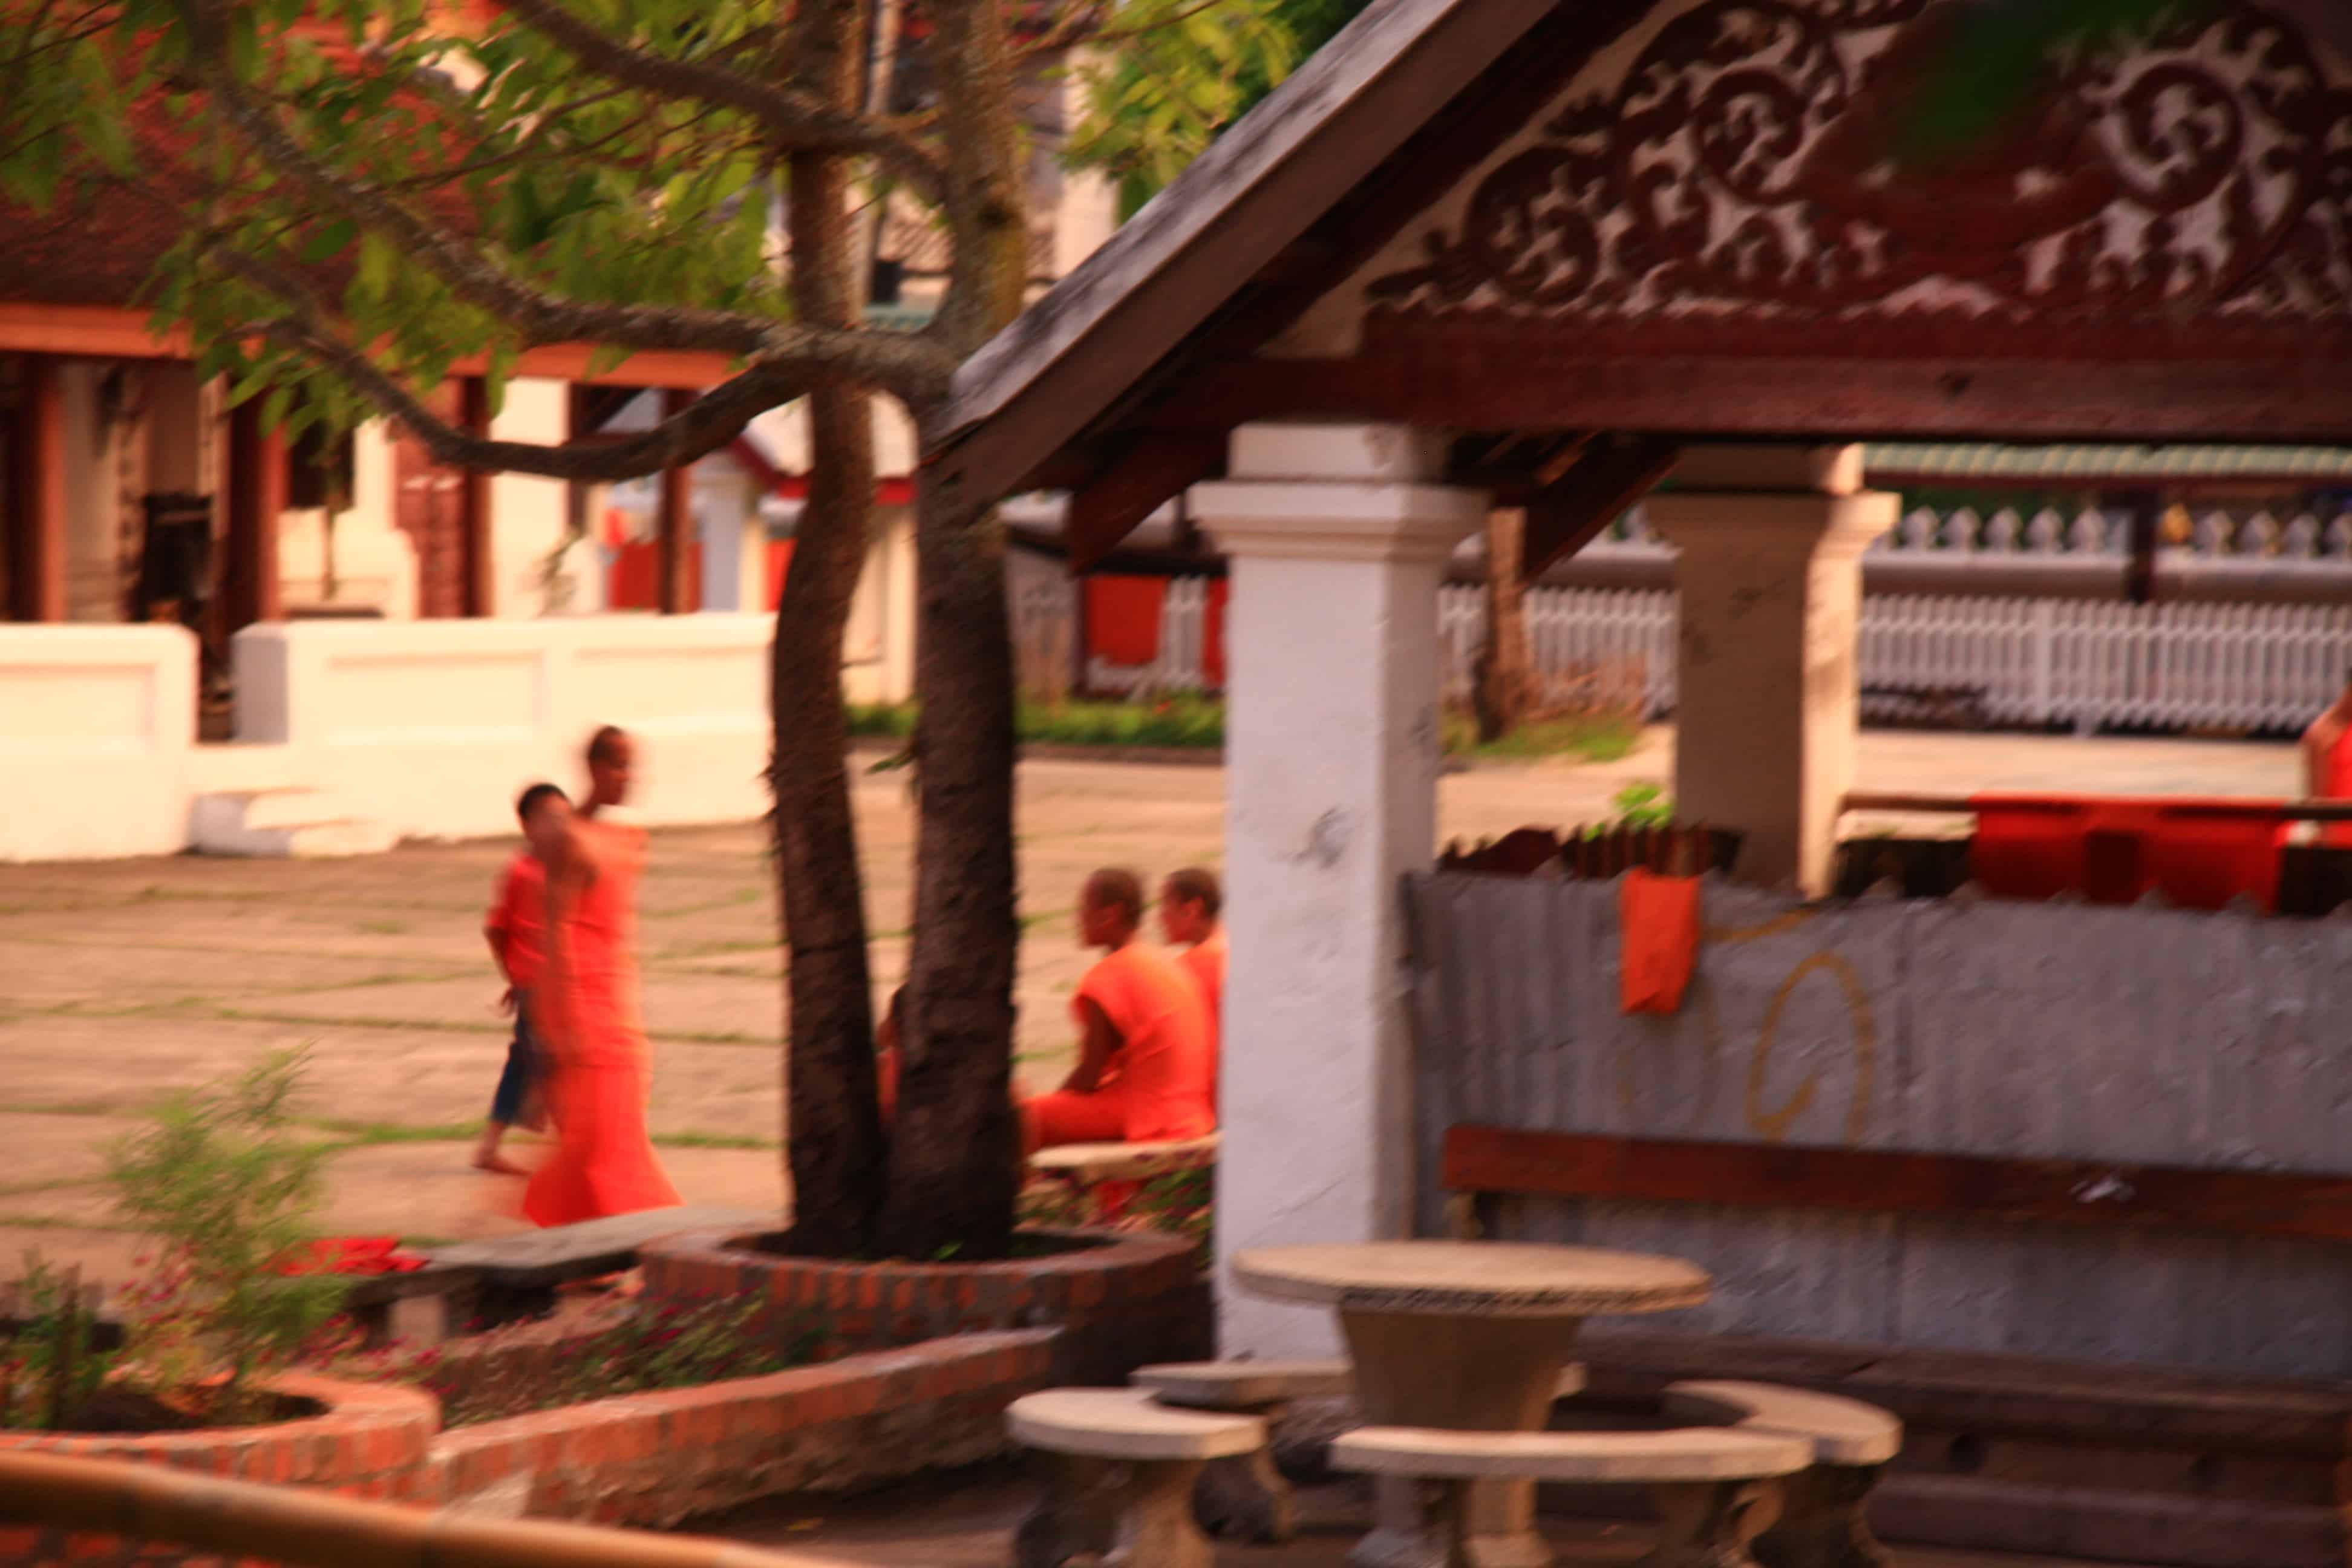 Mönche im Tempel von Luang Prabang